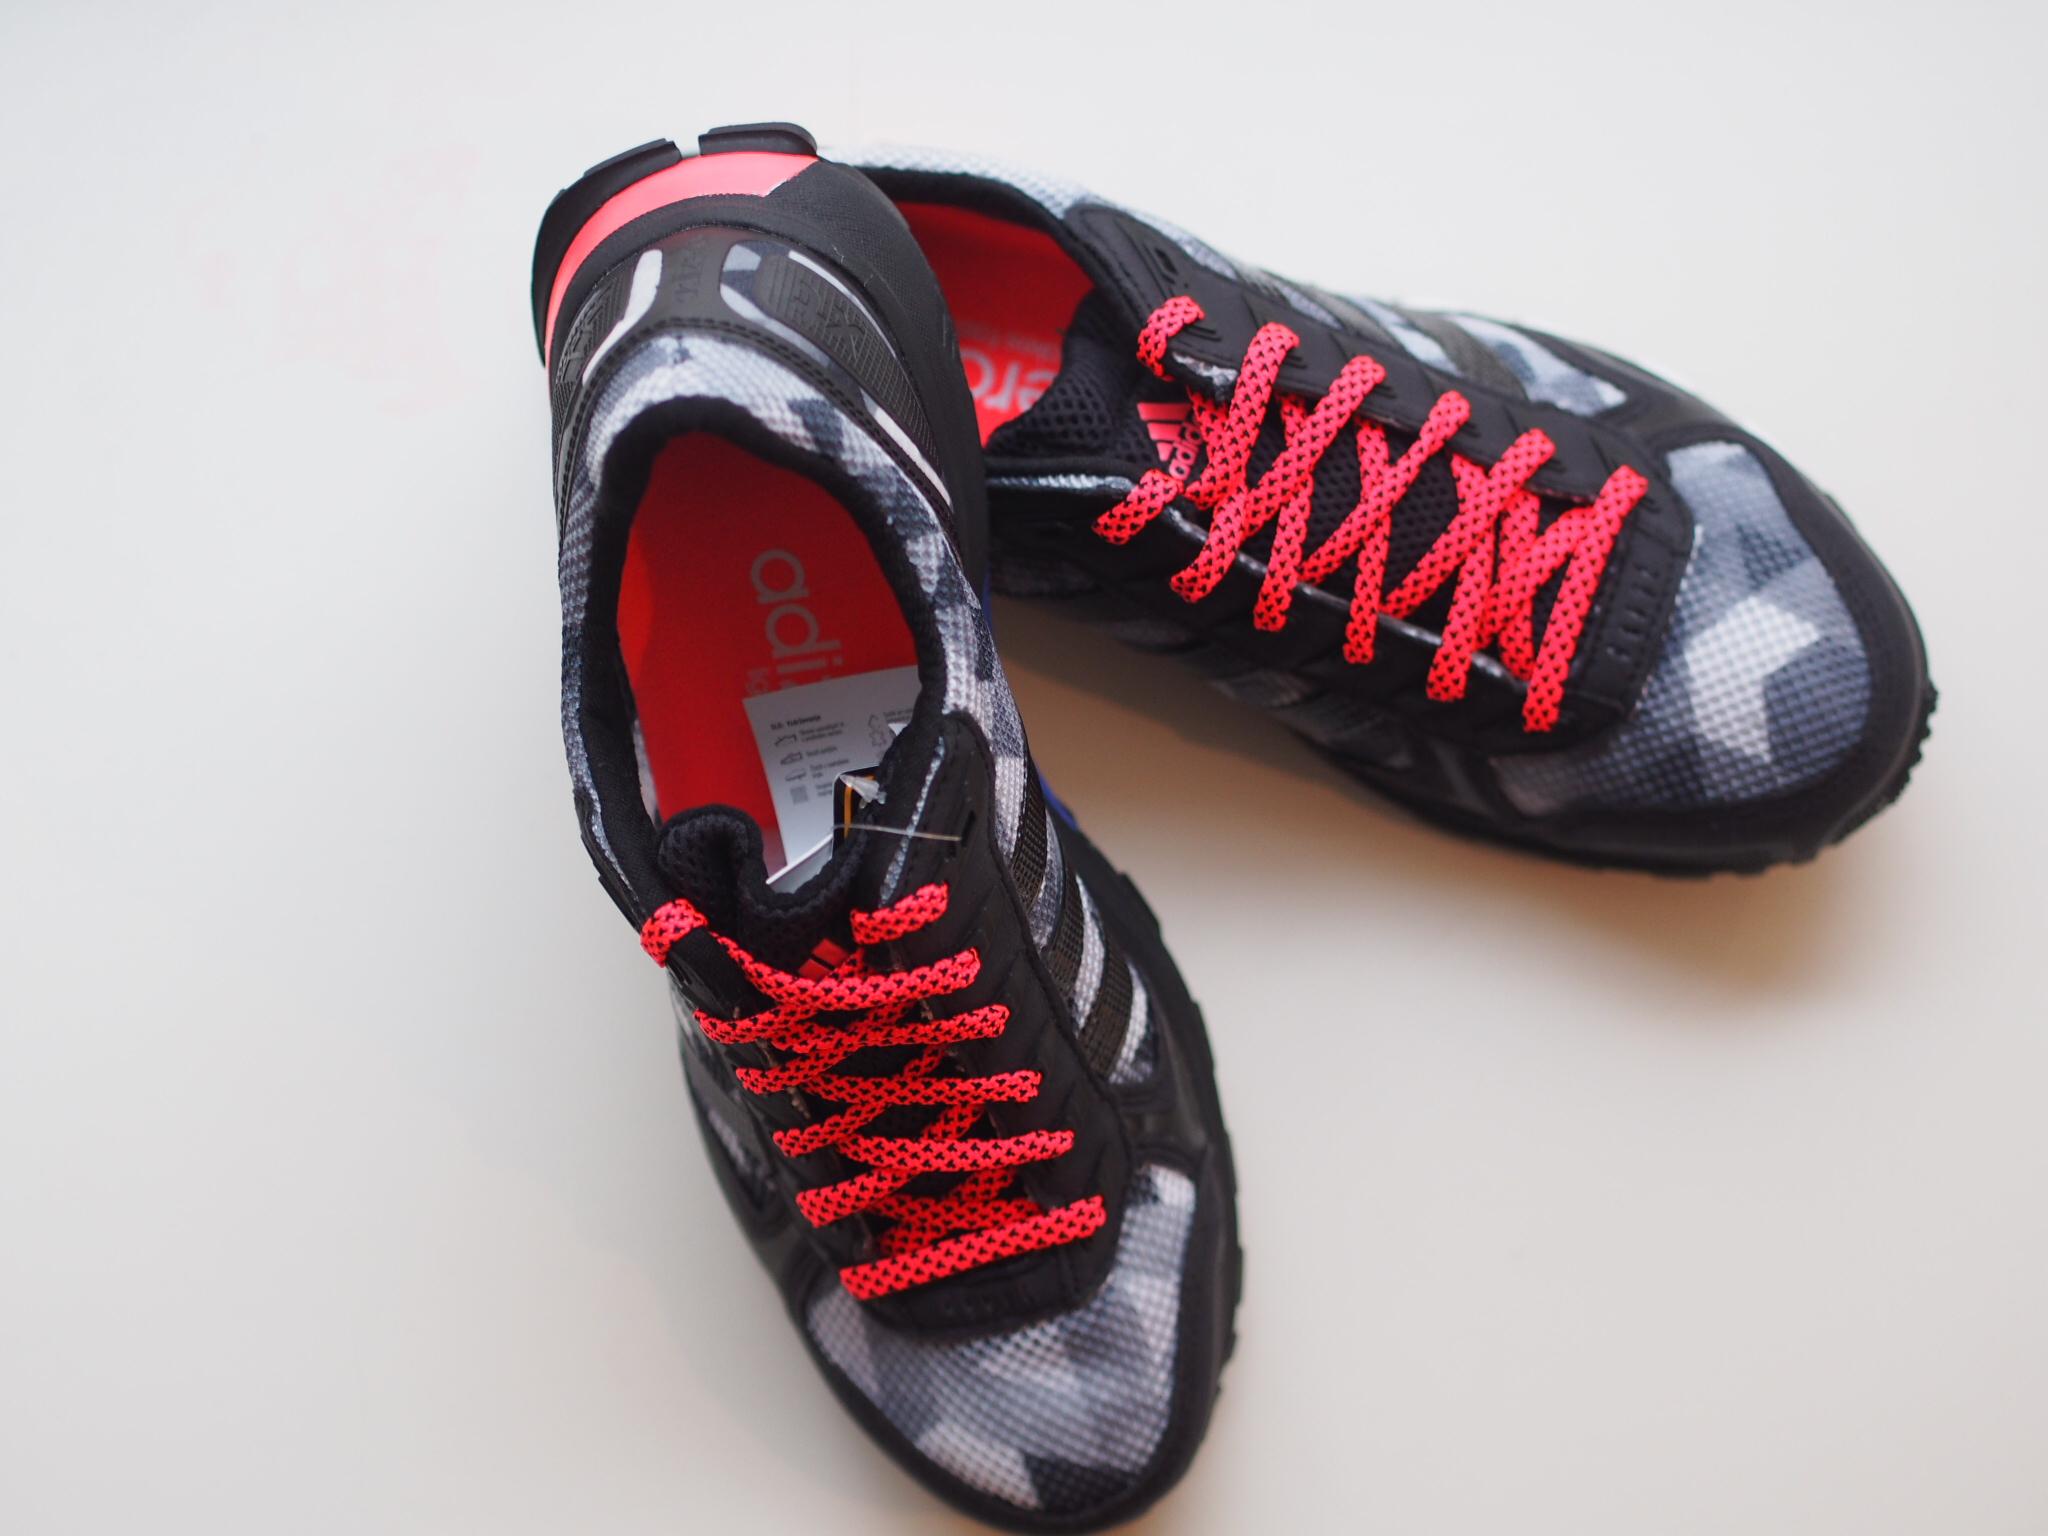 6a50e15f5 adidas adizero xt,adidas samba colors > OFF71% Free shipping!